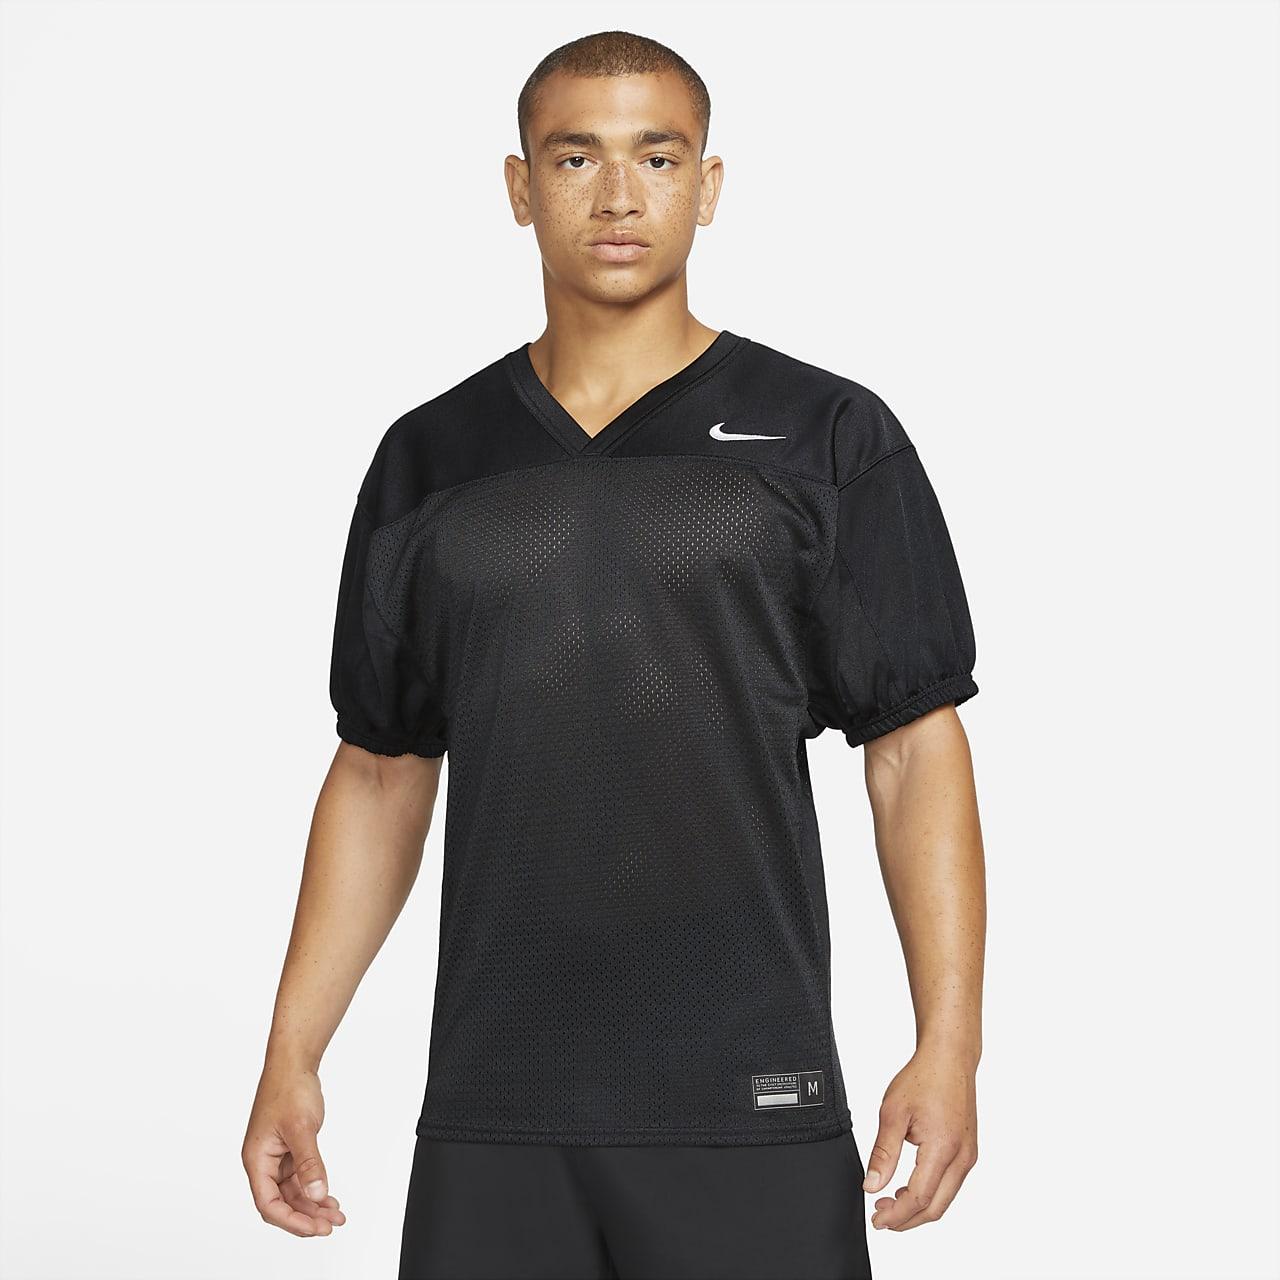 Nike Recruit Practice Men's Football Jersey